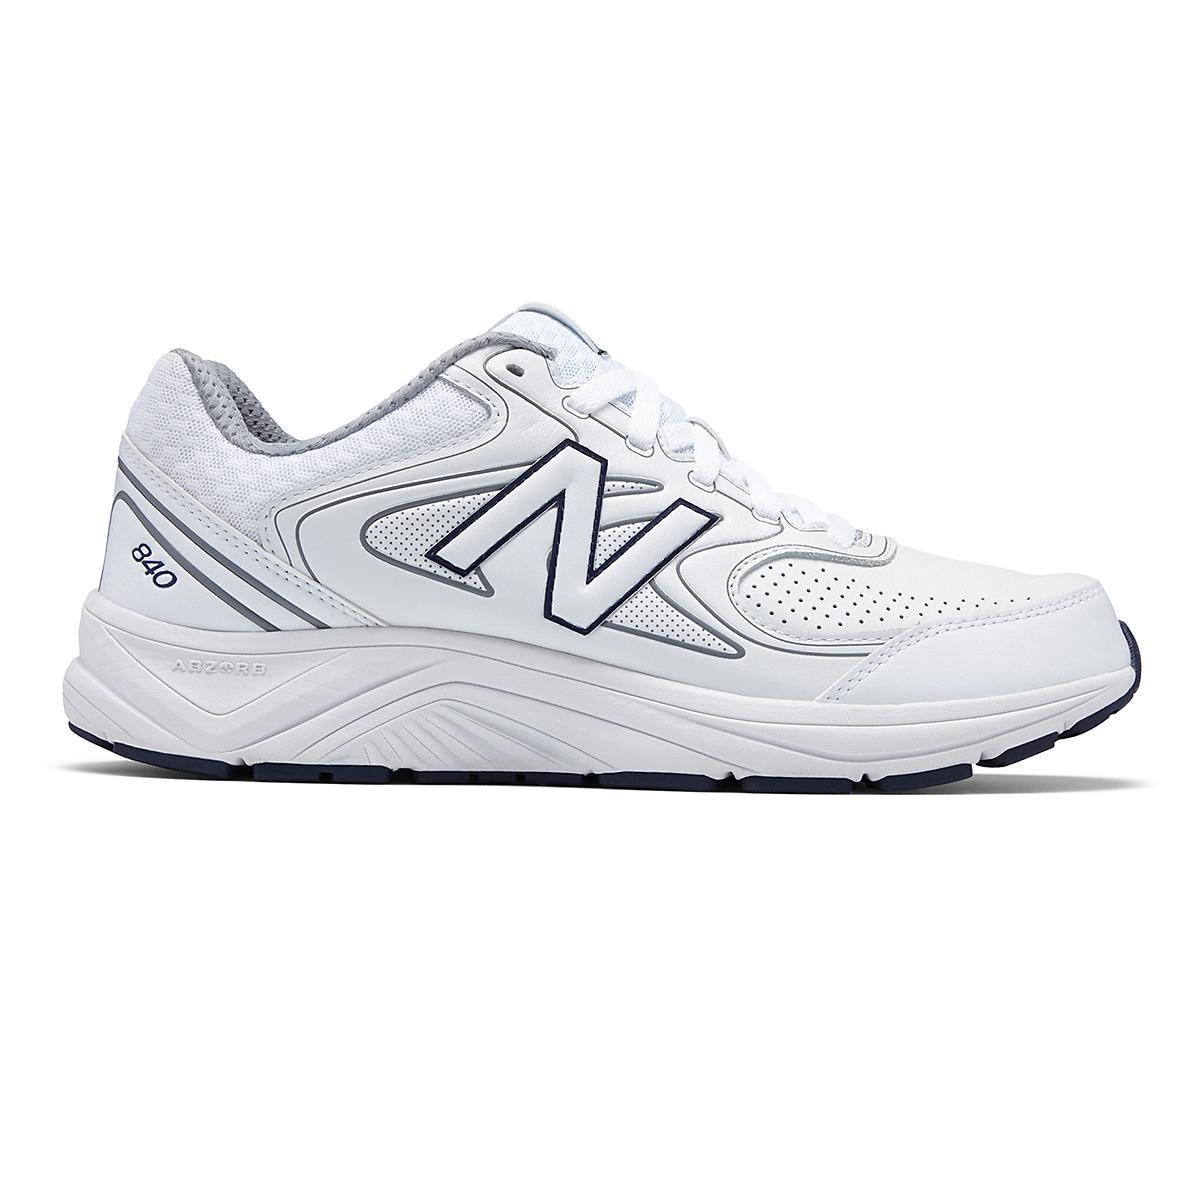 Men's New Balance 840v2 Leather Walking Shoe - Color: White/Navy - Size: 7 - Width: Wide, White/Navy, large, image 1